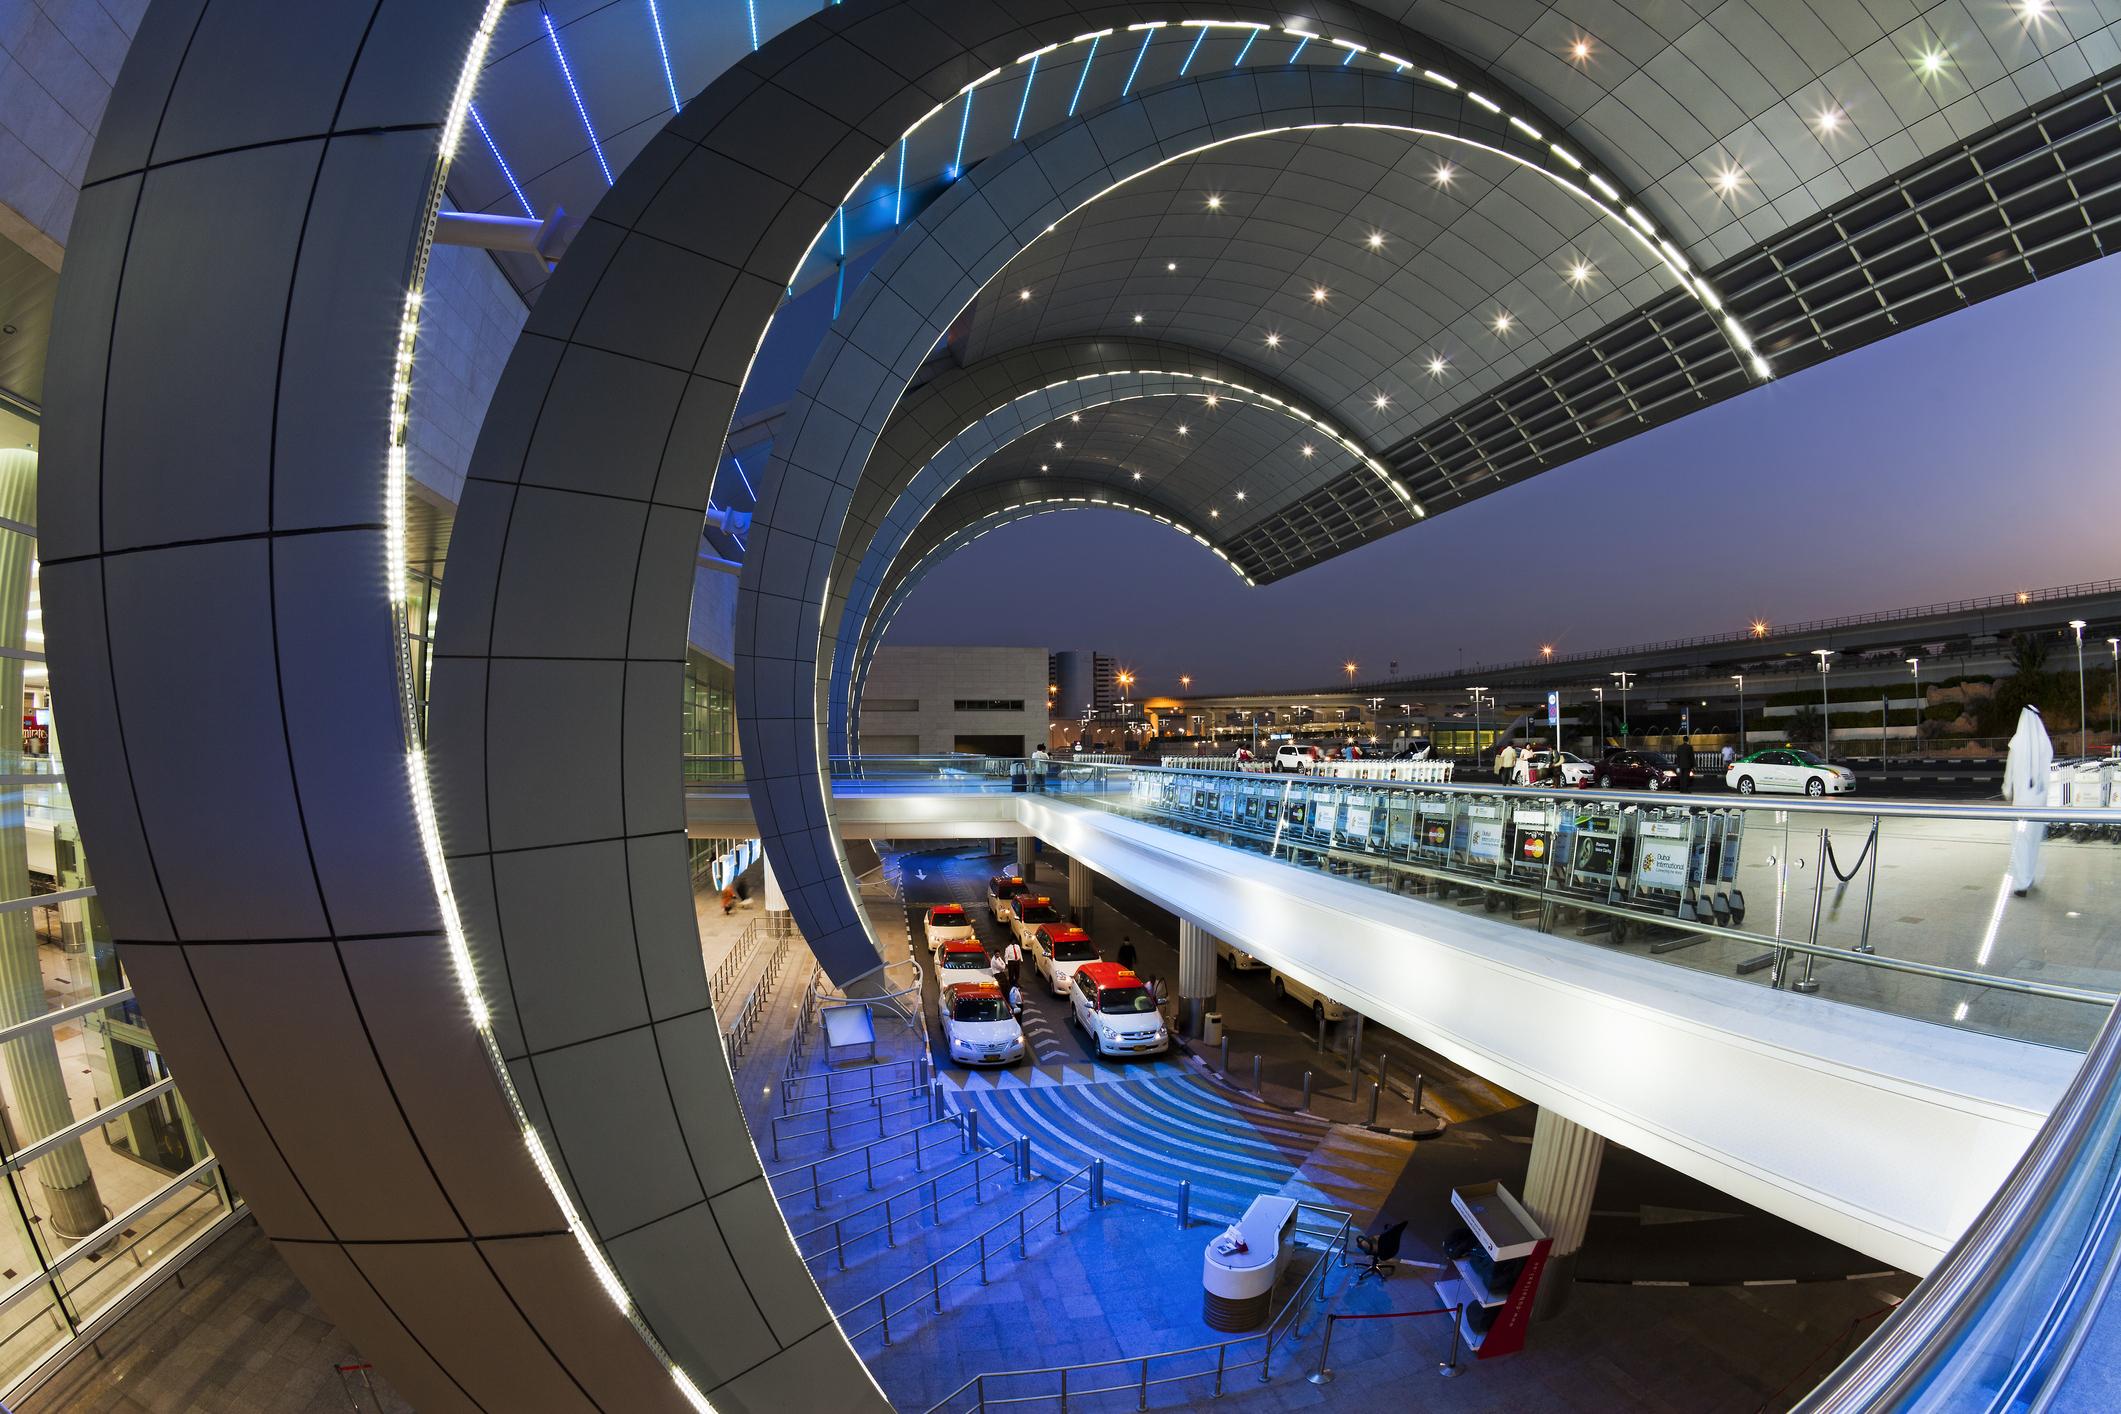 Modern architecture of Terminal 3 at Dubai International Airport, Dubai, UAE.